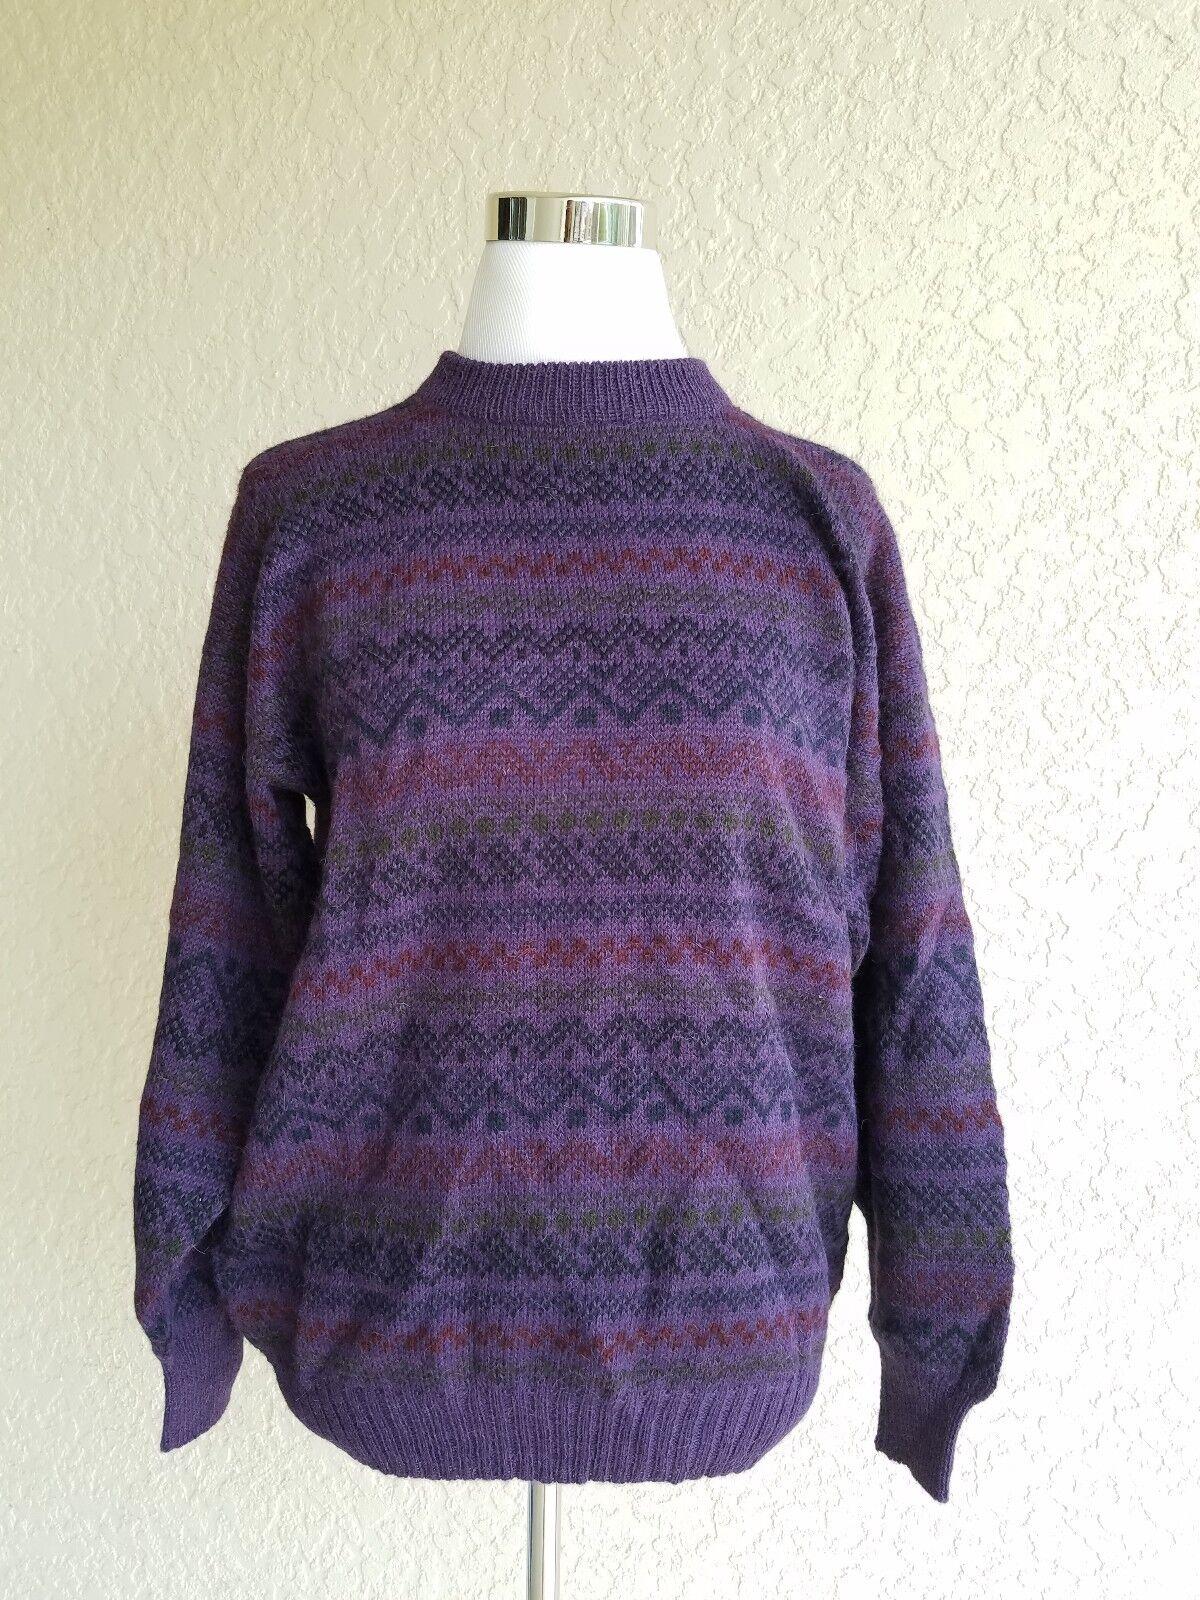 Matices De Los Andes Women sweater 100% baby alpaca purple lama geometric